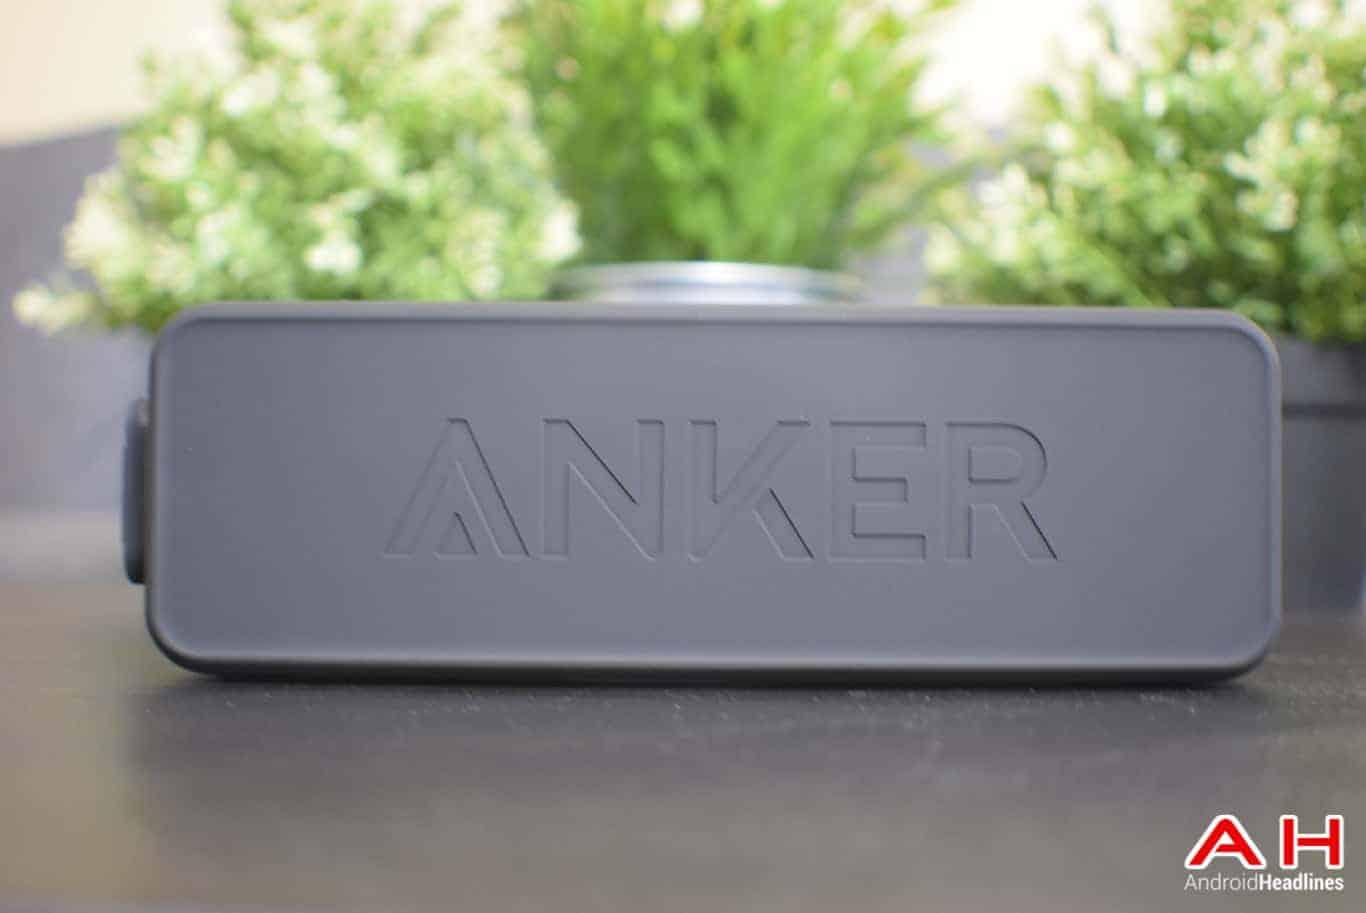 Anker SoundCore 2 AM AH 7